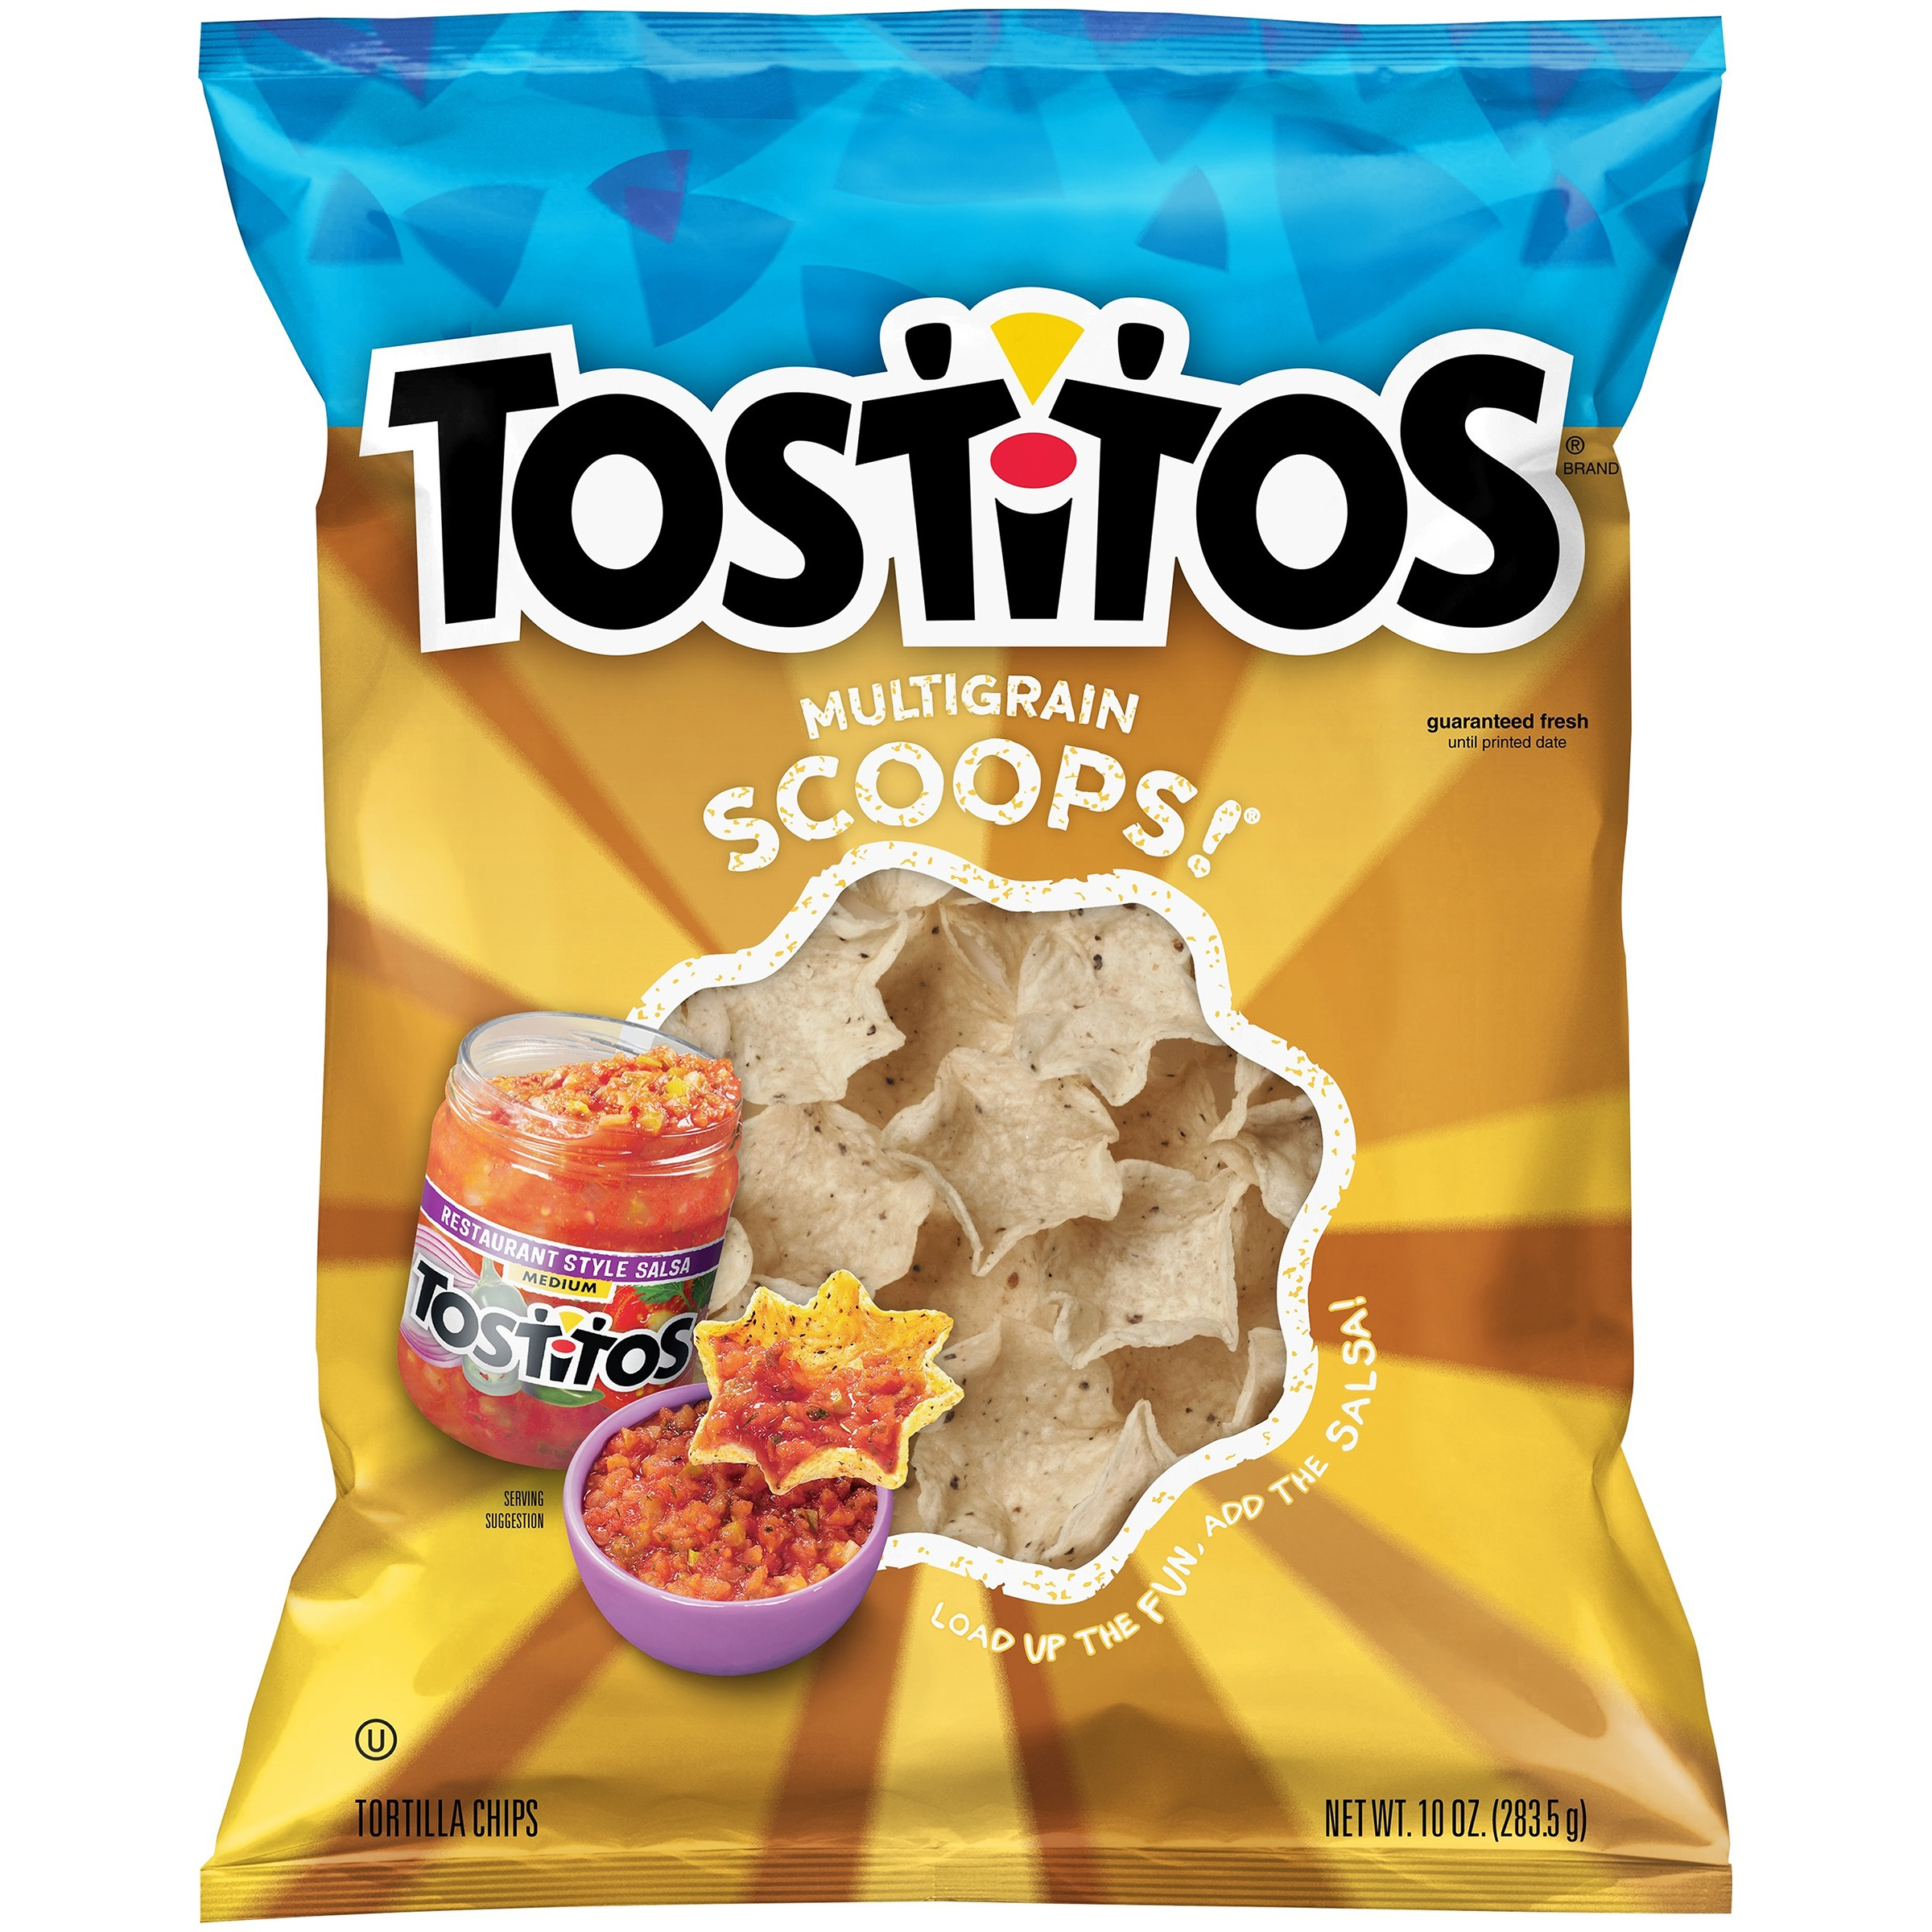 Tostitos Multigrain Scoops Tortilla Chips, 10 oz Bag